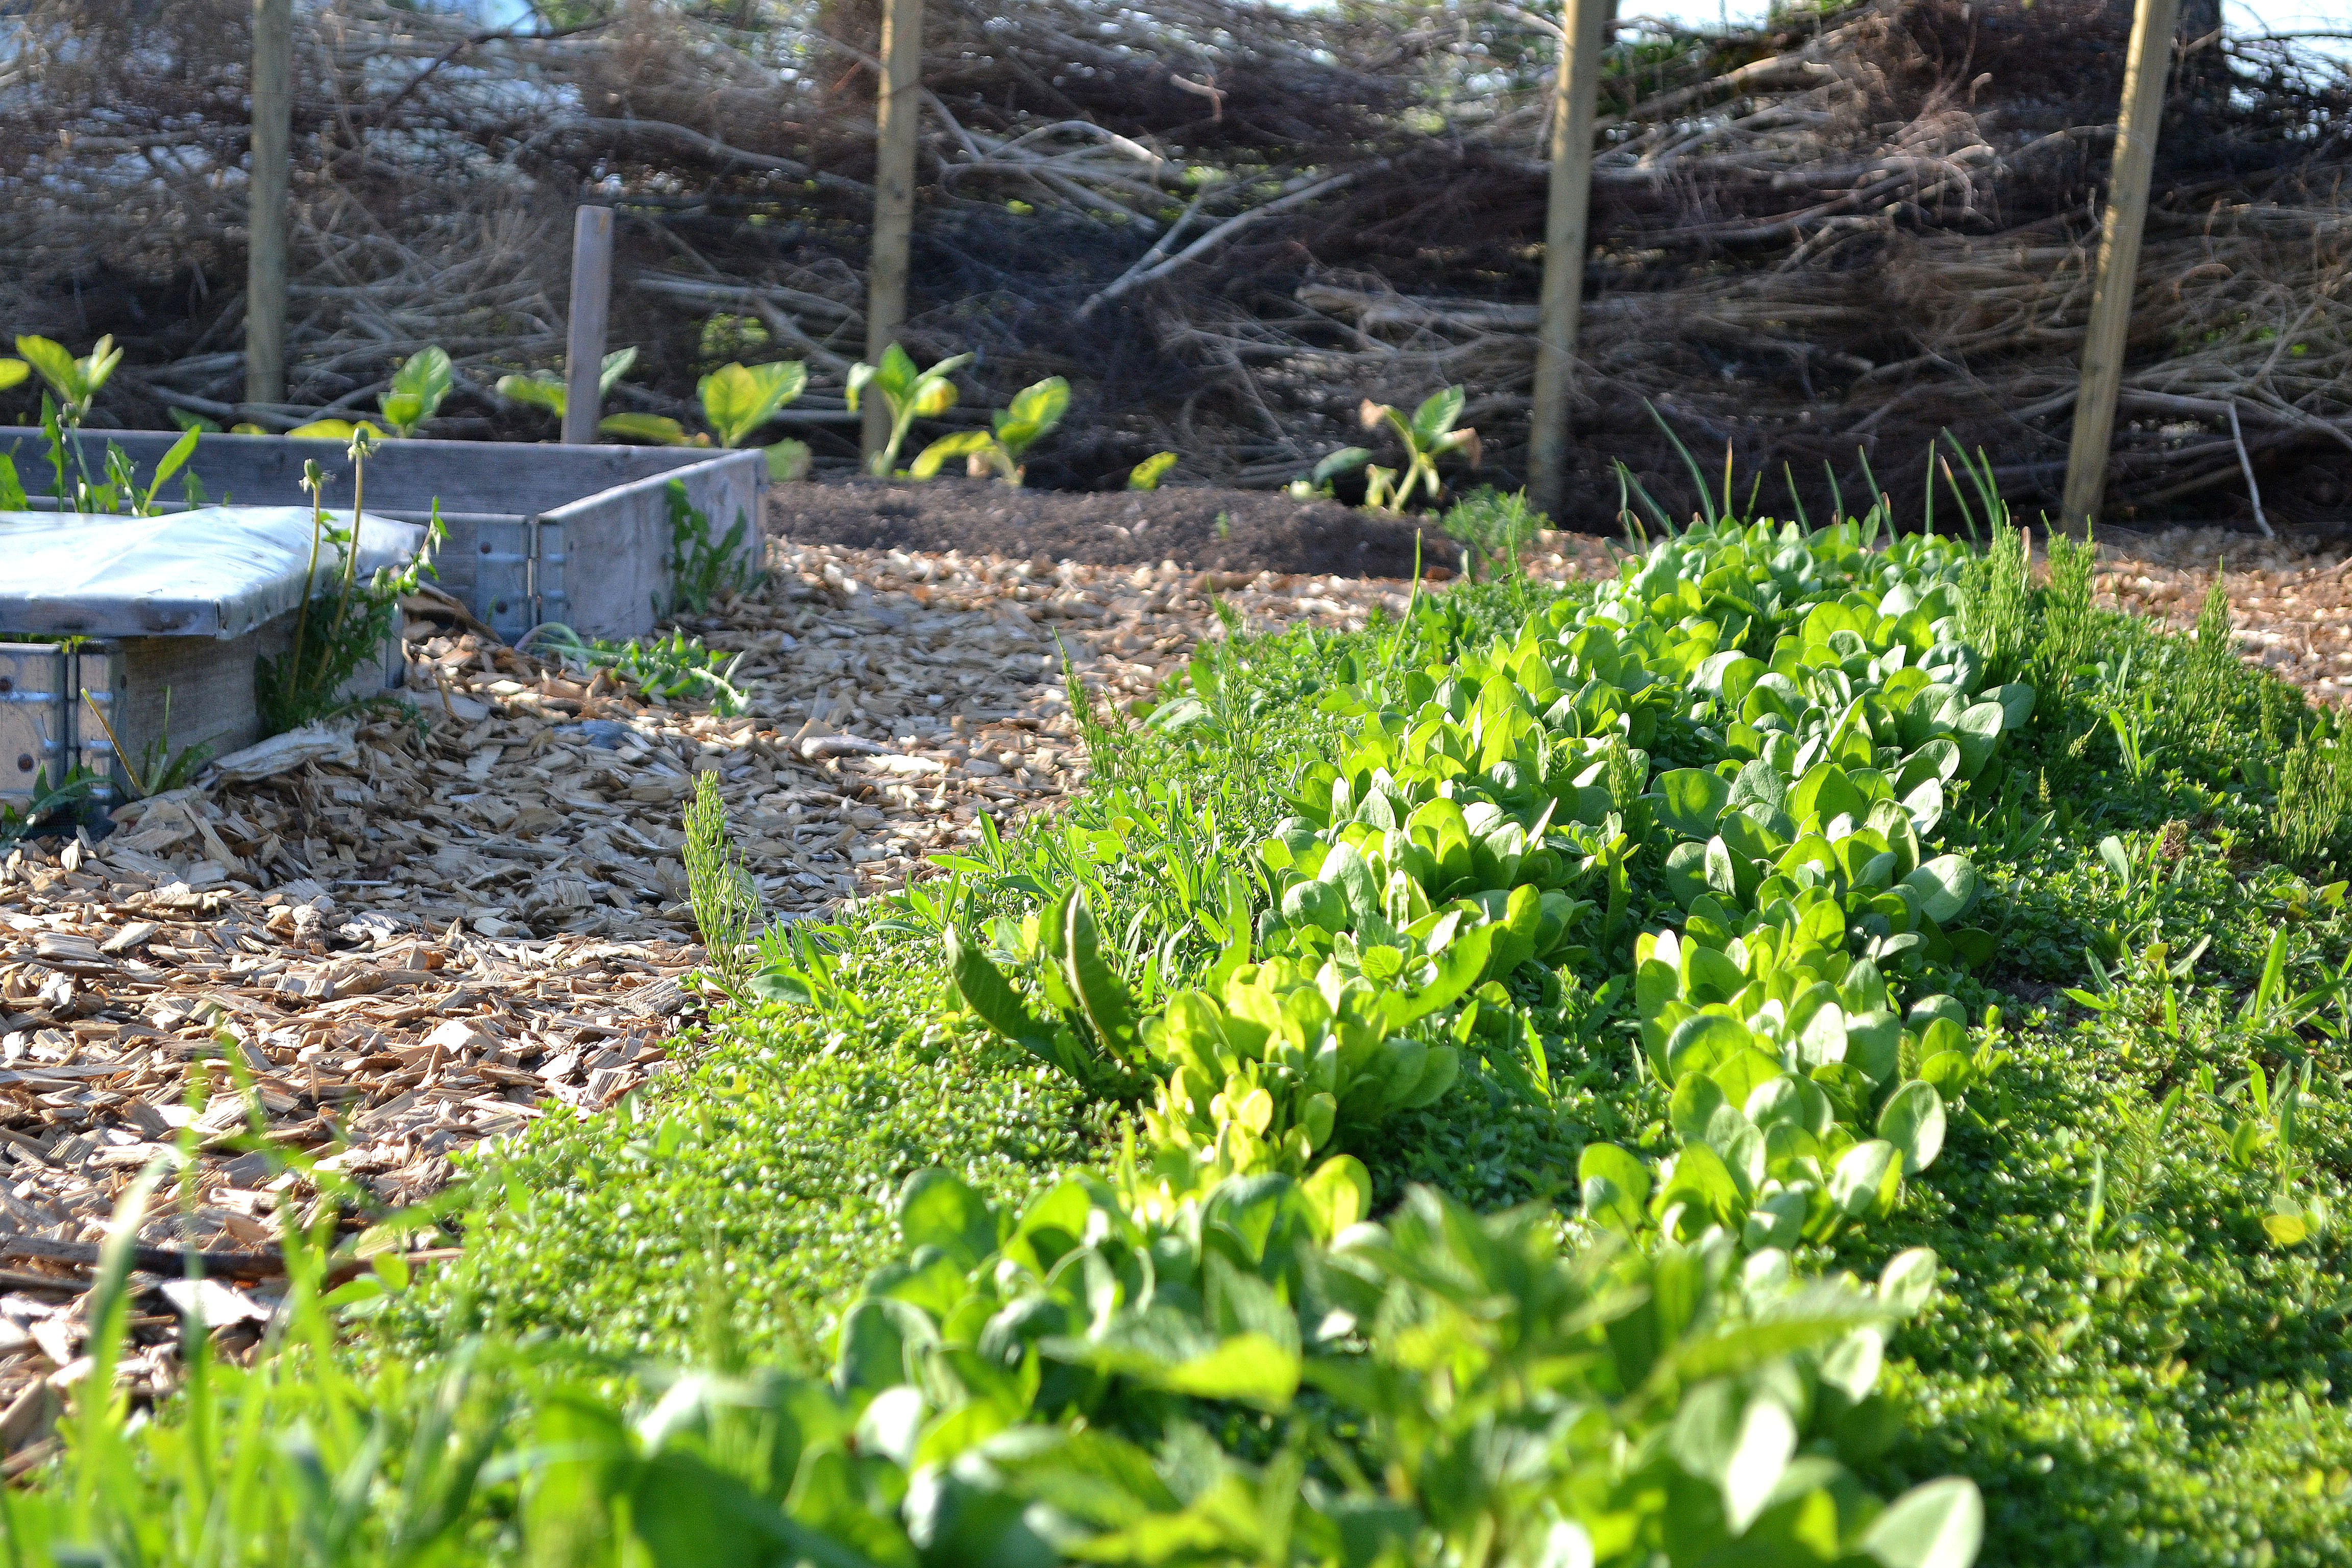 Odlingen med det nya staketet i bakgrunden. My growing bed with the brushwood fence in the background.